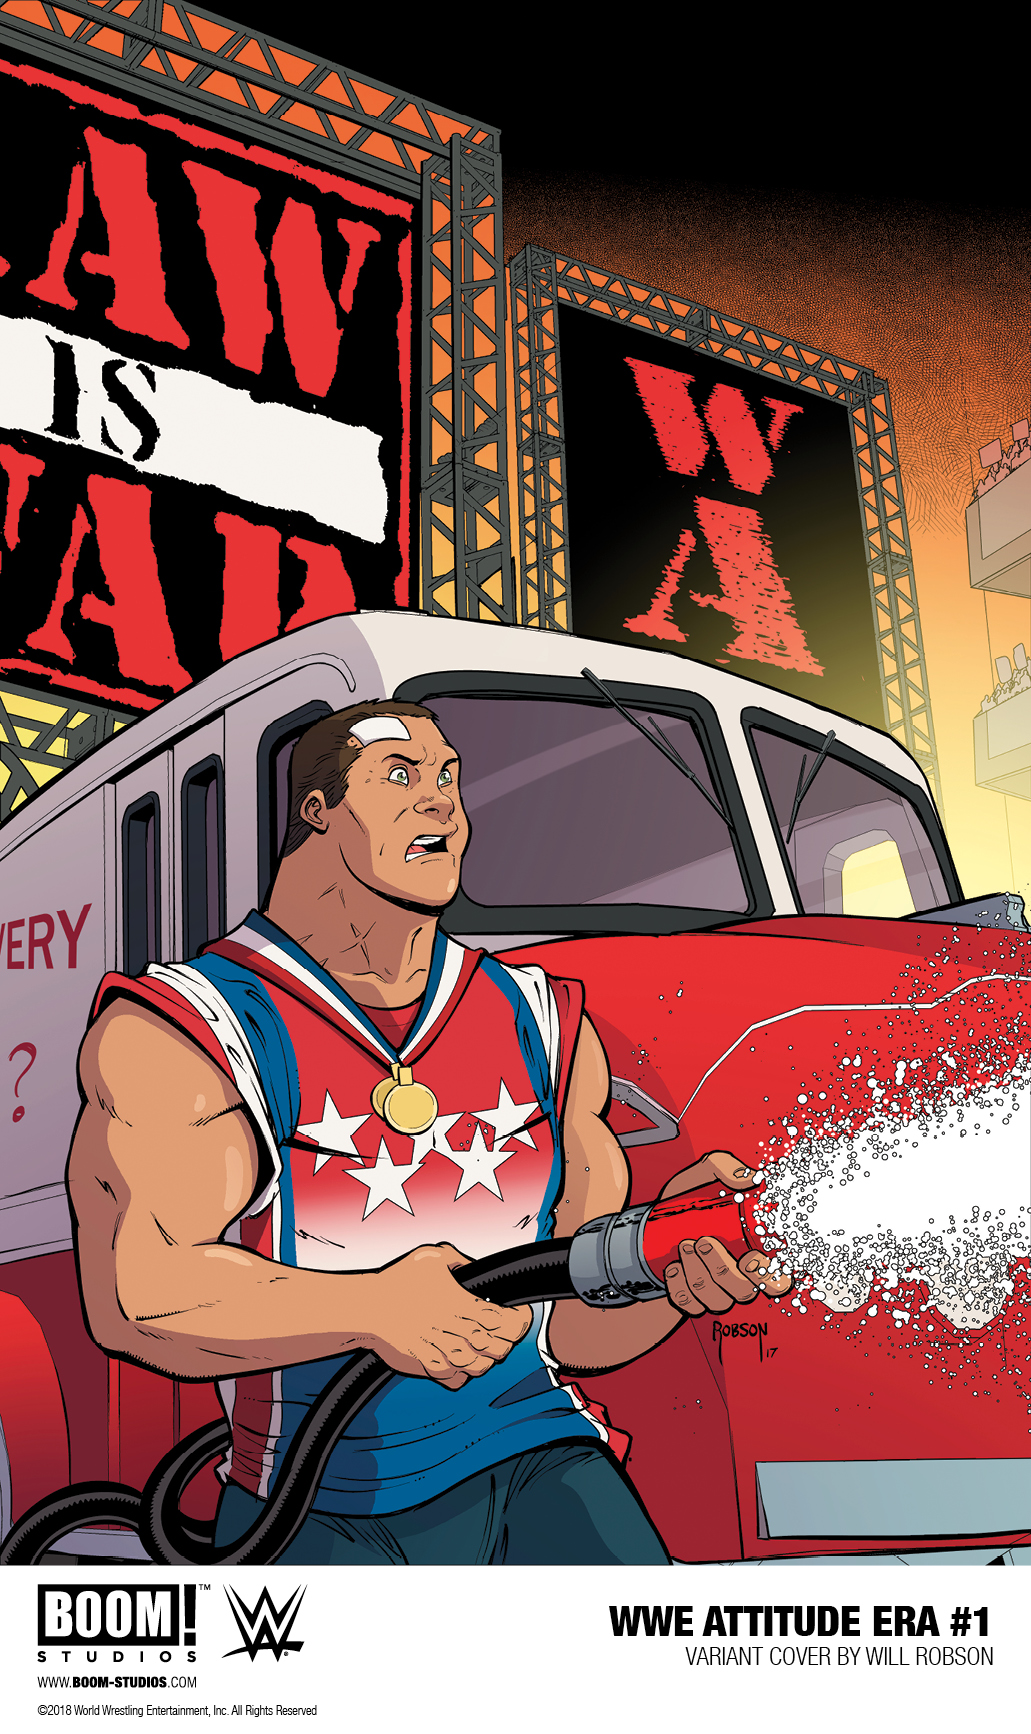 WWE_AttitudeEra_001_Variant1_PROMO.jpg